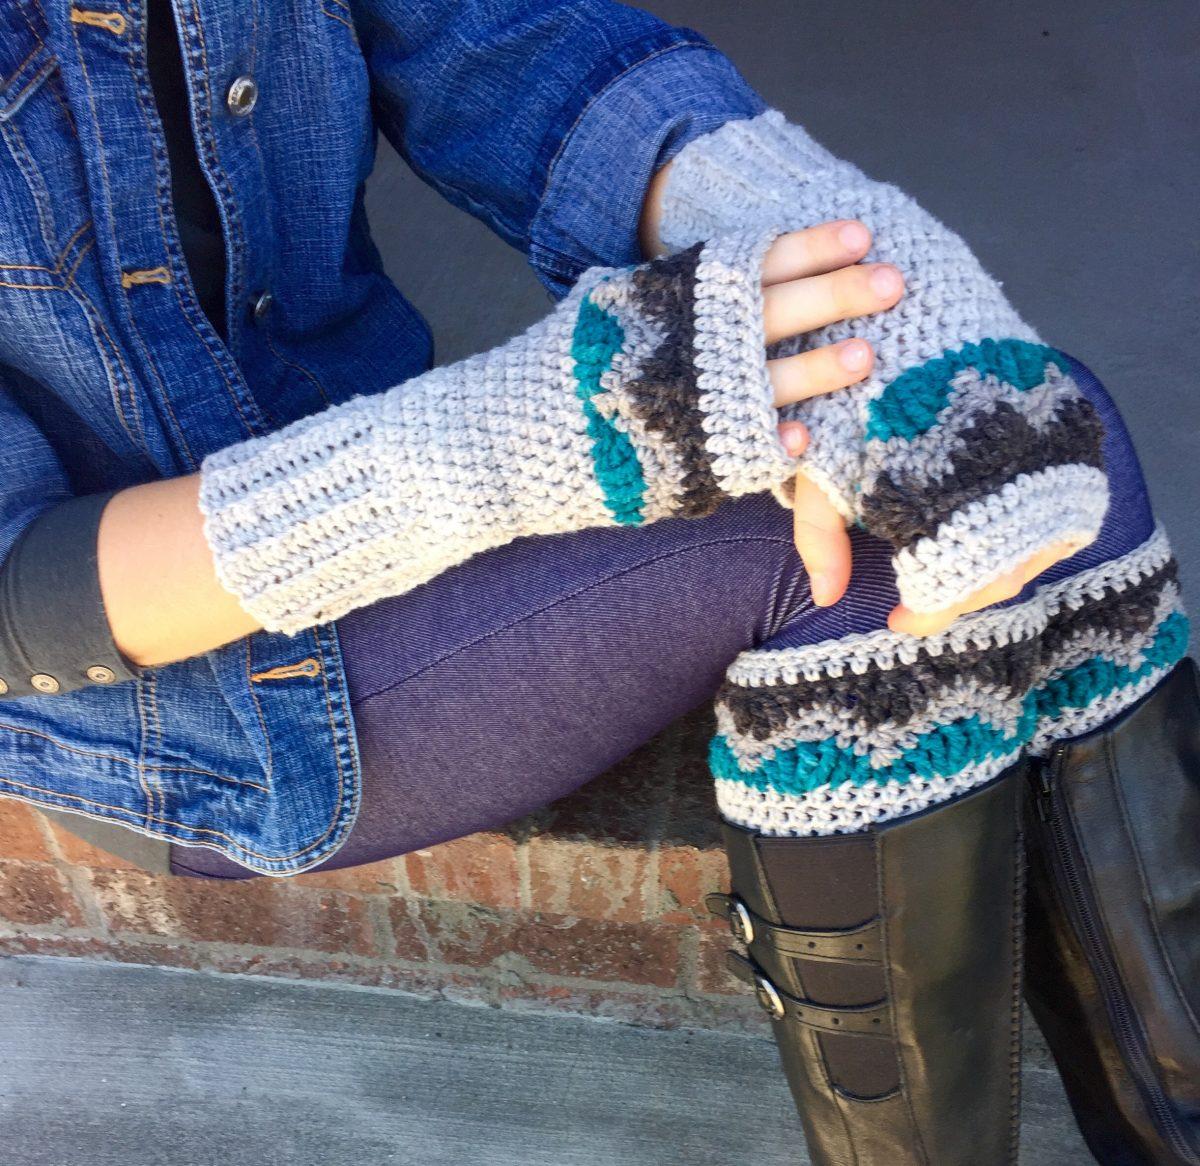 Alpine boot cuffs and fingerless gloves